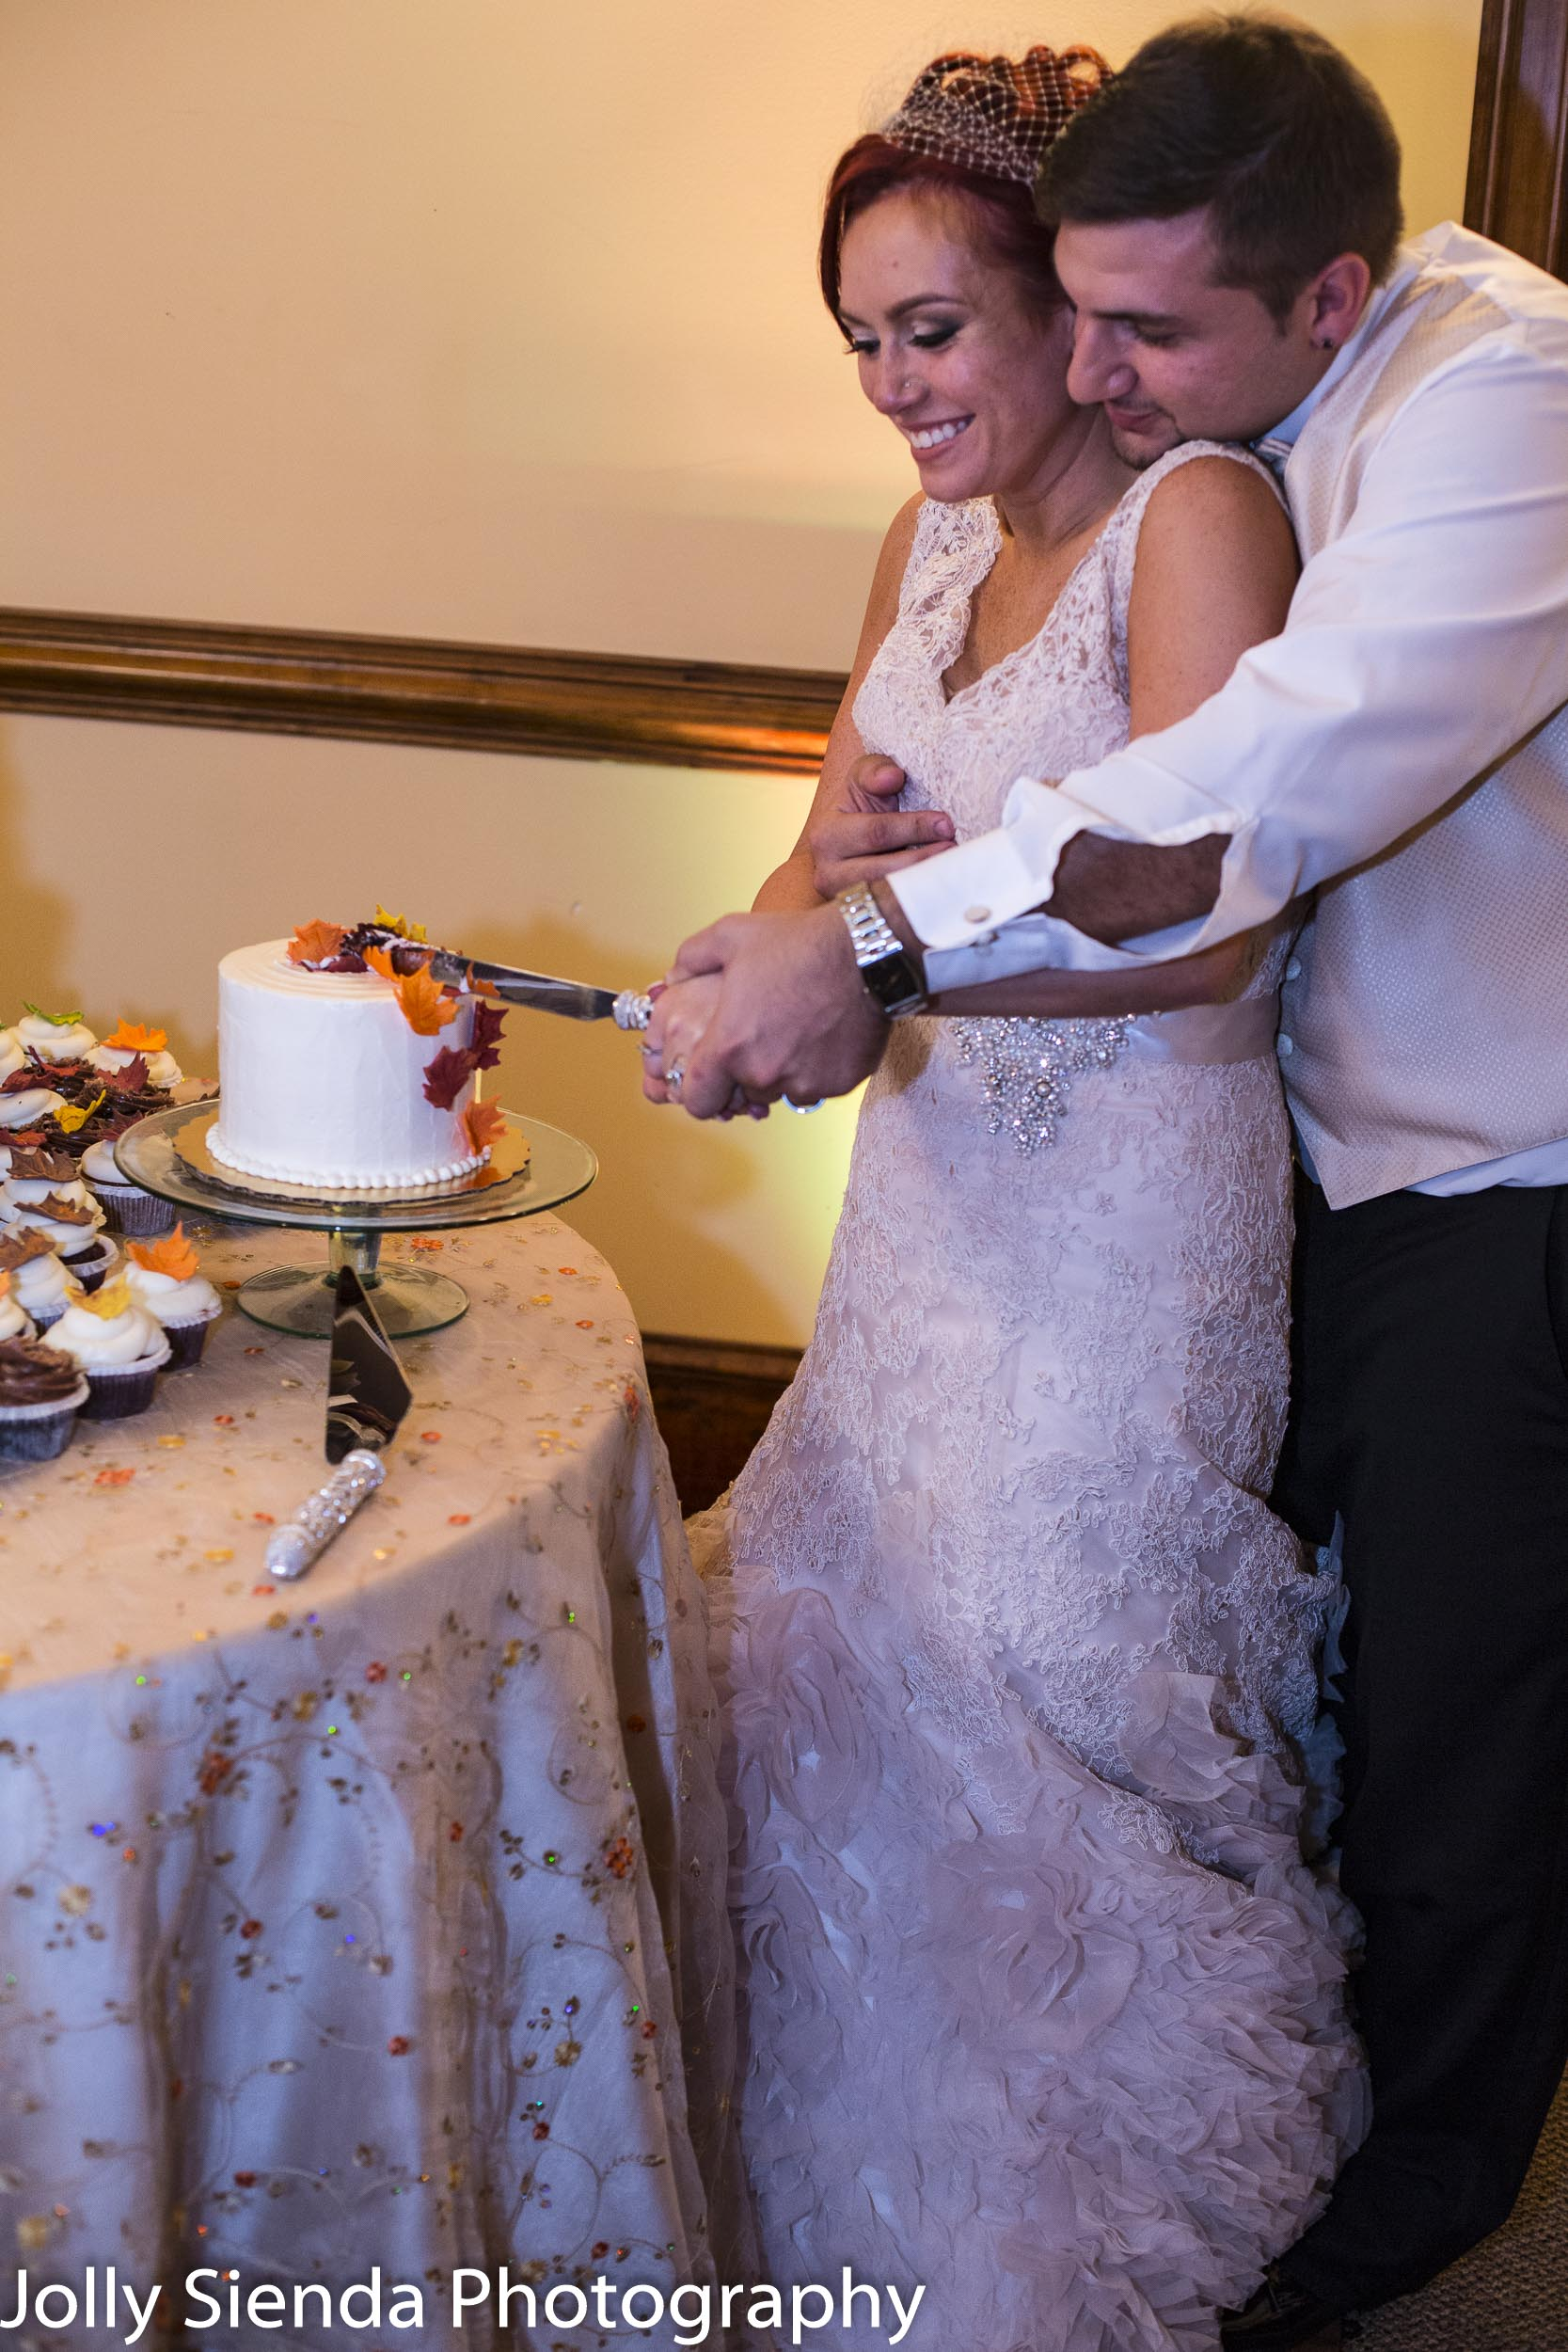 Cutting the autumn wedding cake